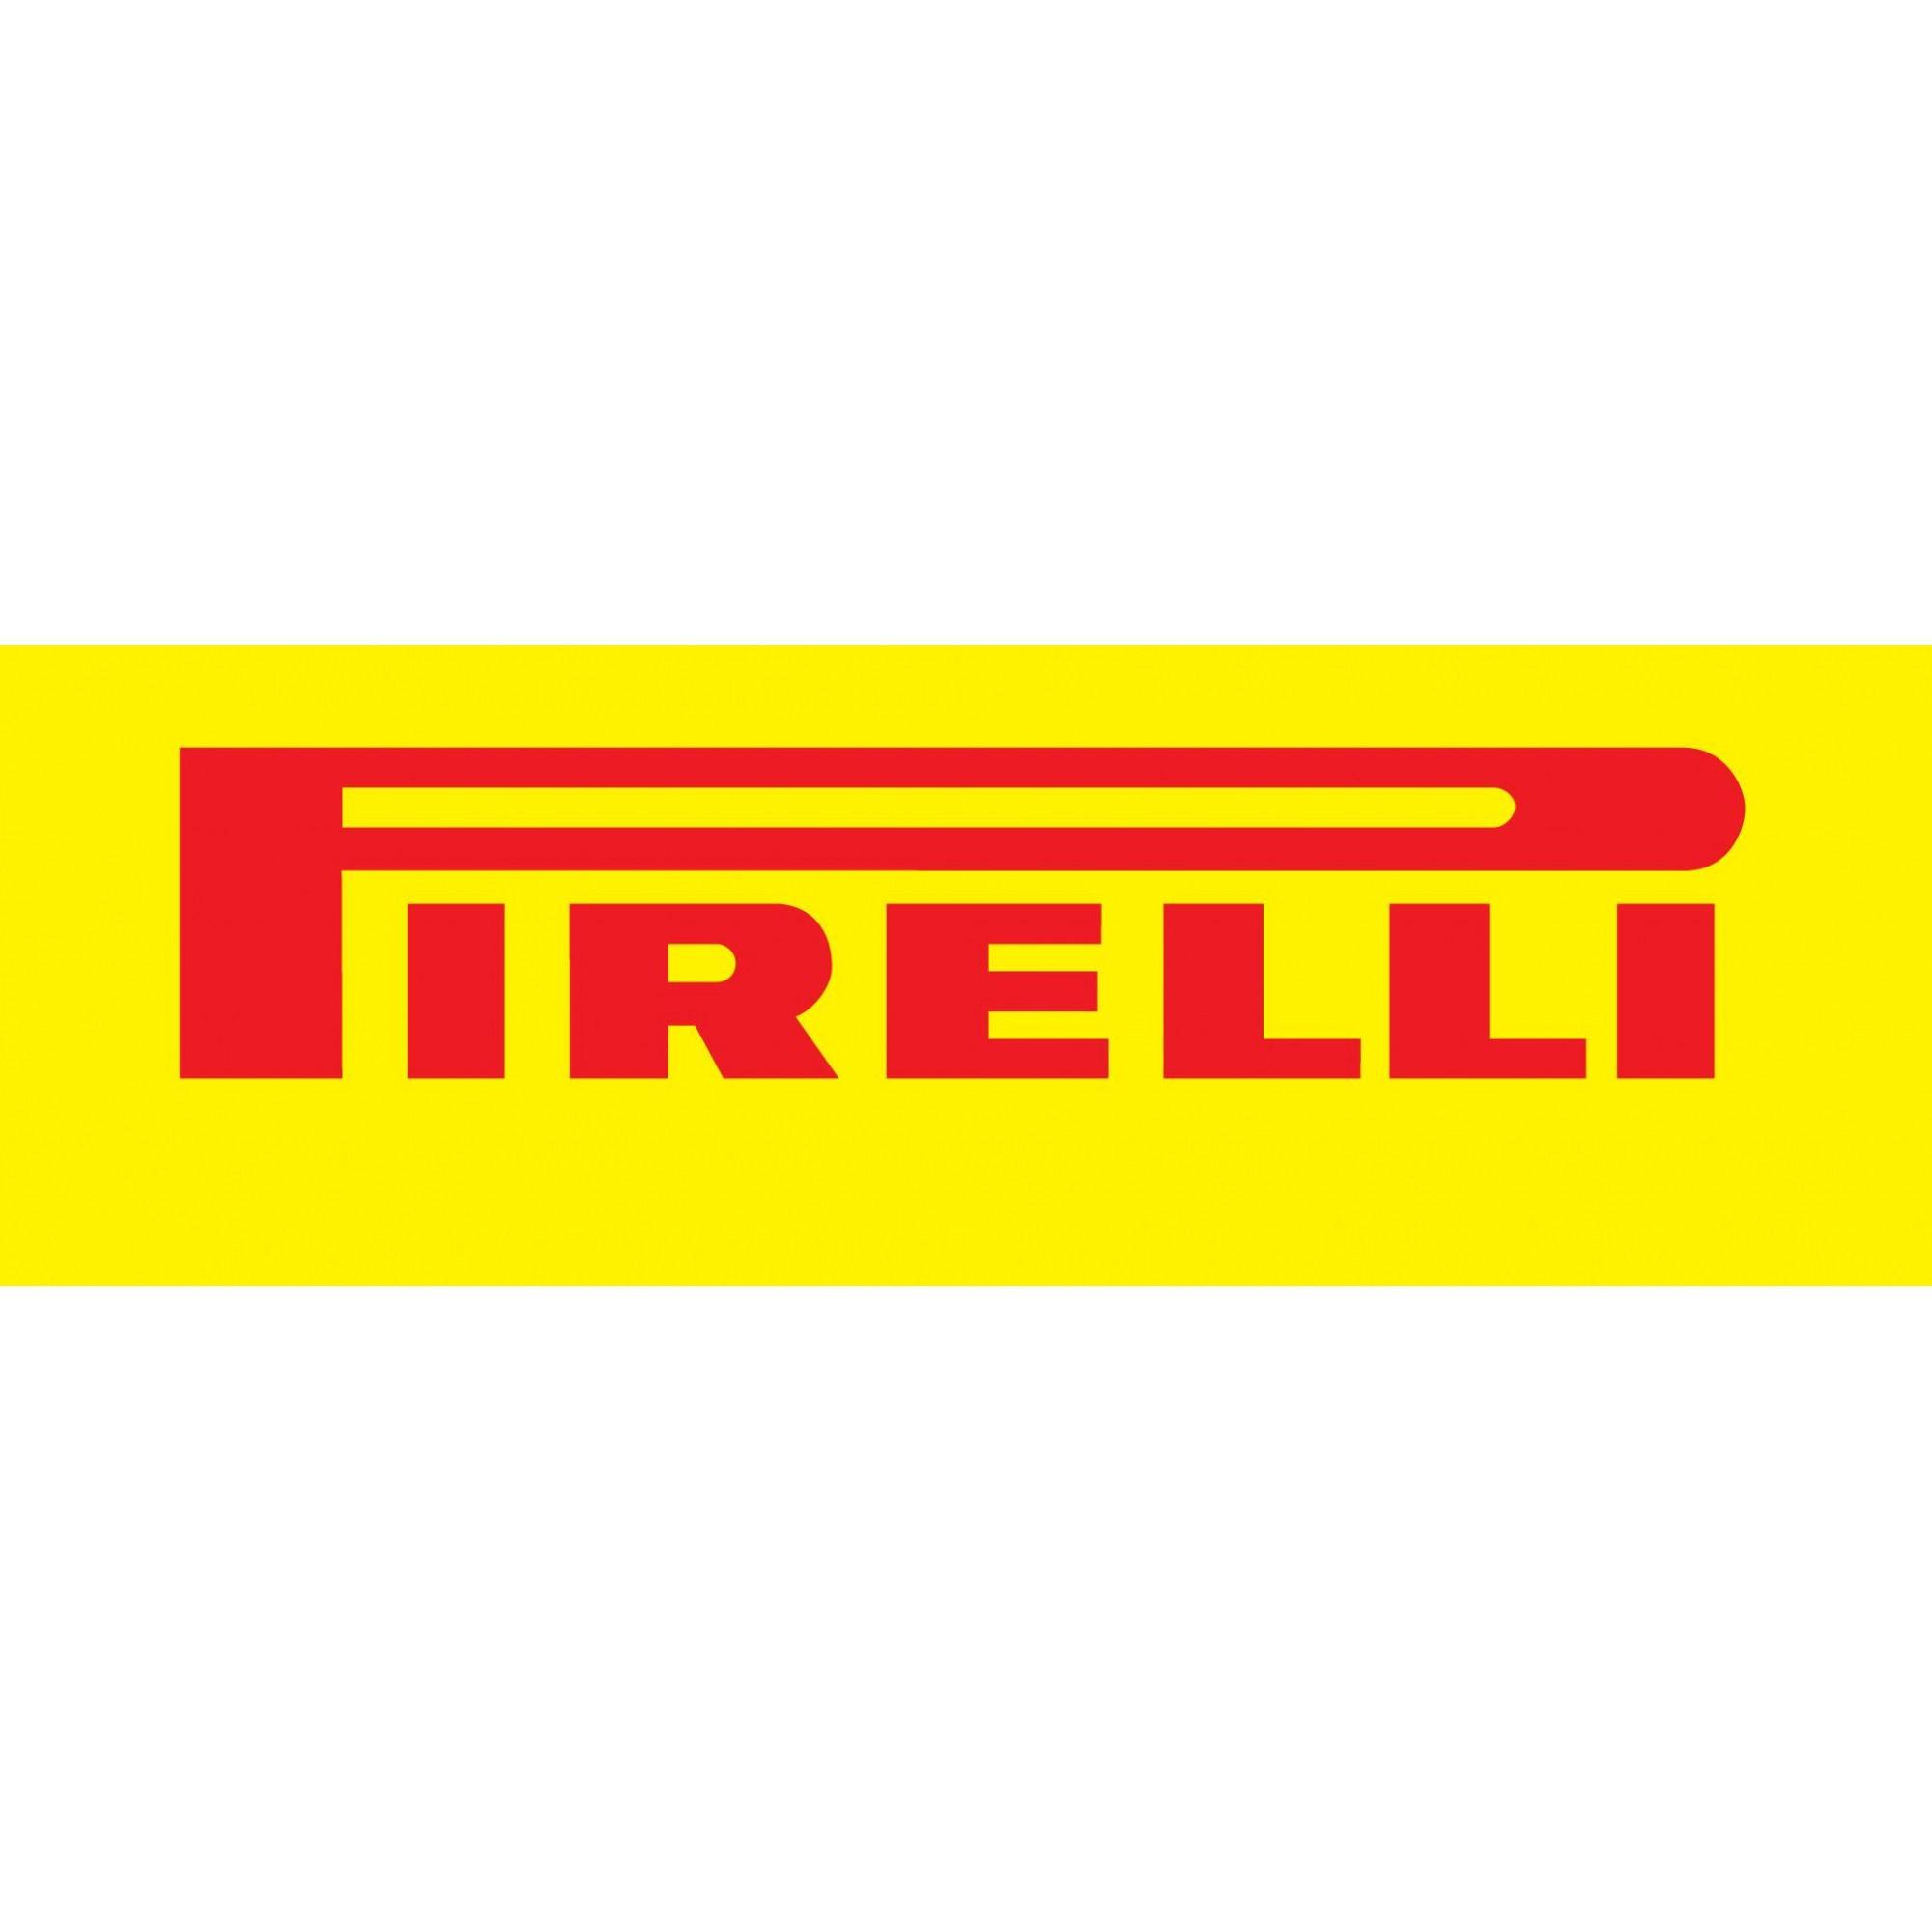 Par Pneu Pirelli Angel Gt 2 Bmw S1000xr S1000 Xr 120+190/55